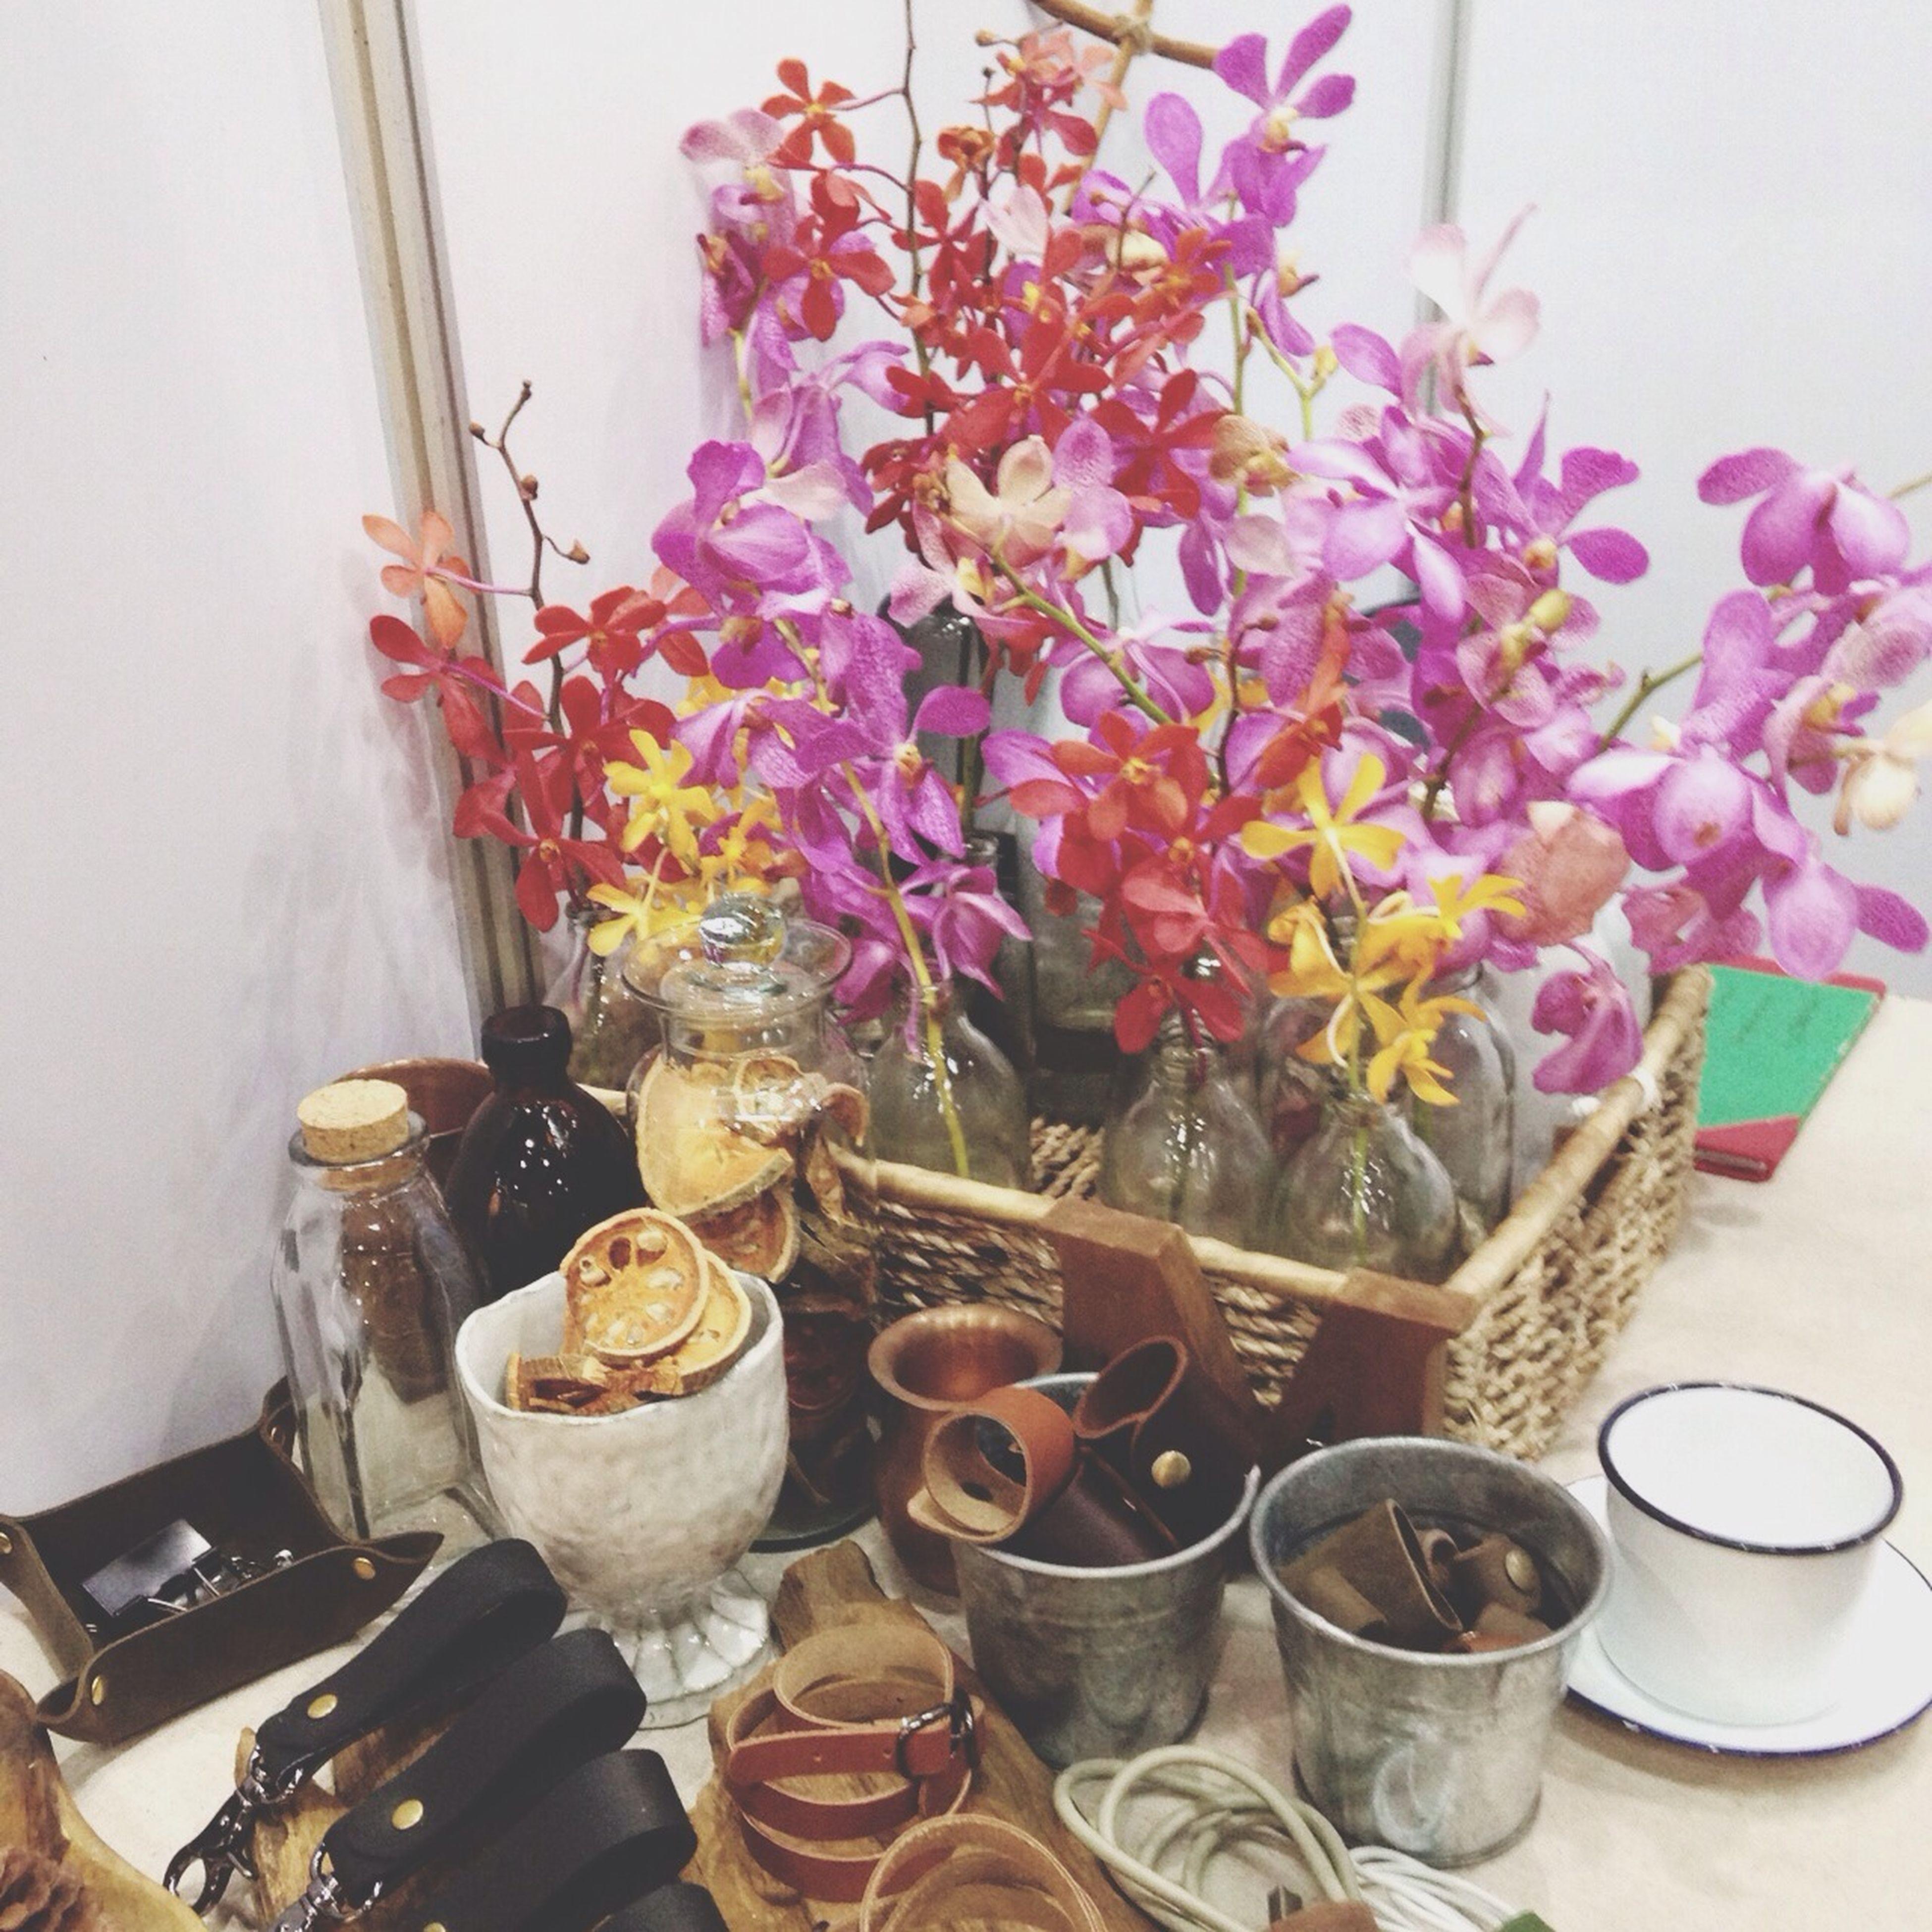 flower, indoors, vase, freshness, table, fragility, still life, petal, flower arrangement, potted plant, home interior, decoration, flower pot, close-up, bunch of flowers, glass - material, variation, plant, no people, flower head